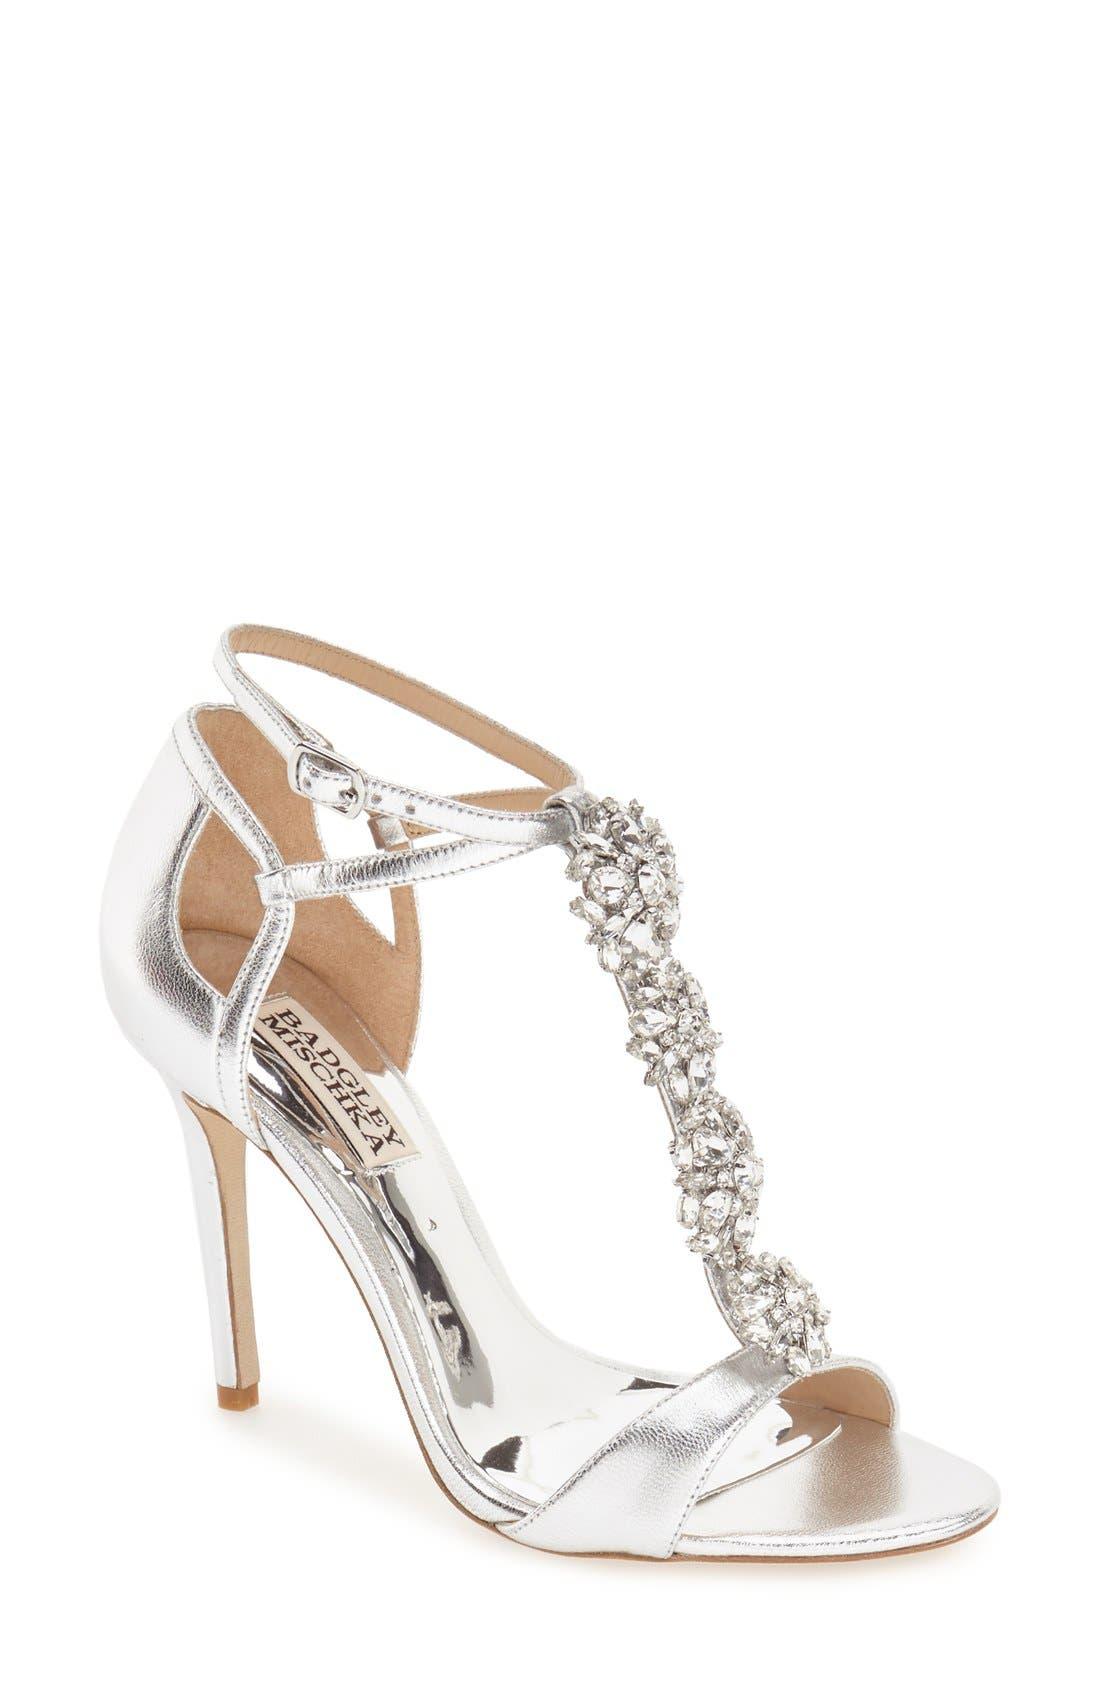 Alternate Image 1 Selected - Badgley Mischka 'Leigh' Embellished Evening Sandal (Women)